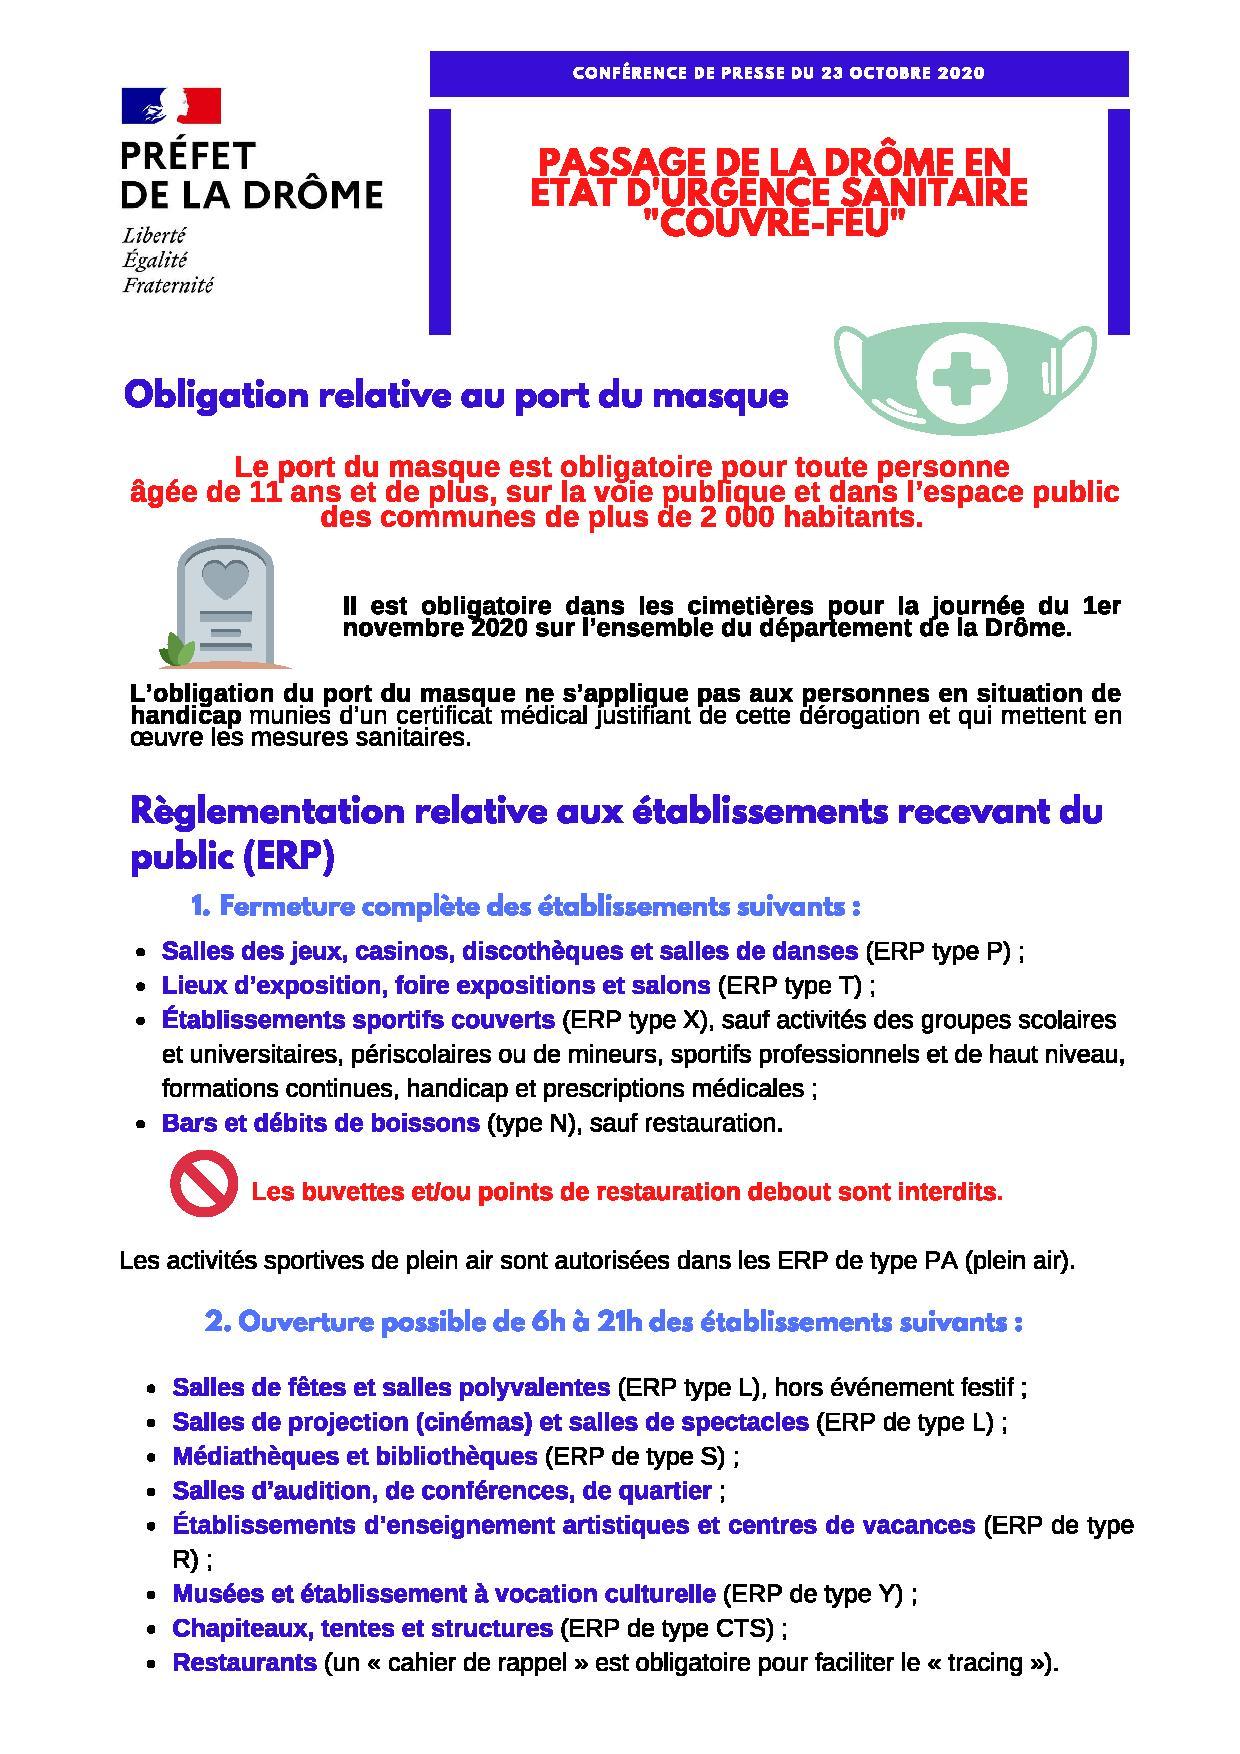 CONF PRESSE P3-page-001.jpg